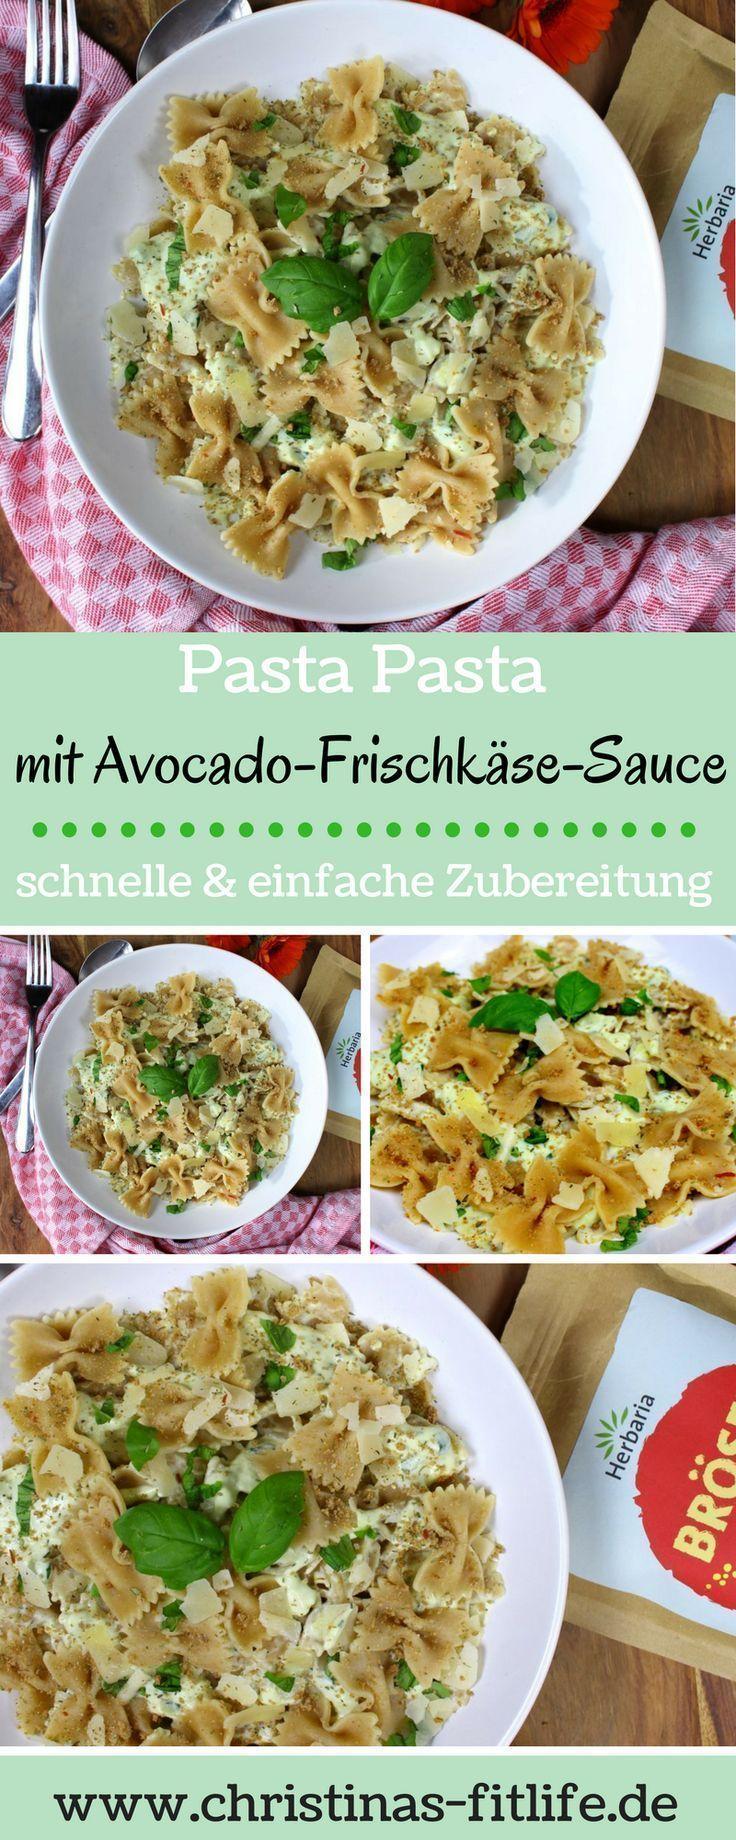 #Hautpflege-Rezepte-Pasta mit Avocado-Frischkäse-Sauce  #Hautpflege-Rezepte Pas…